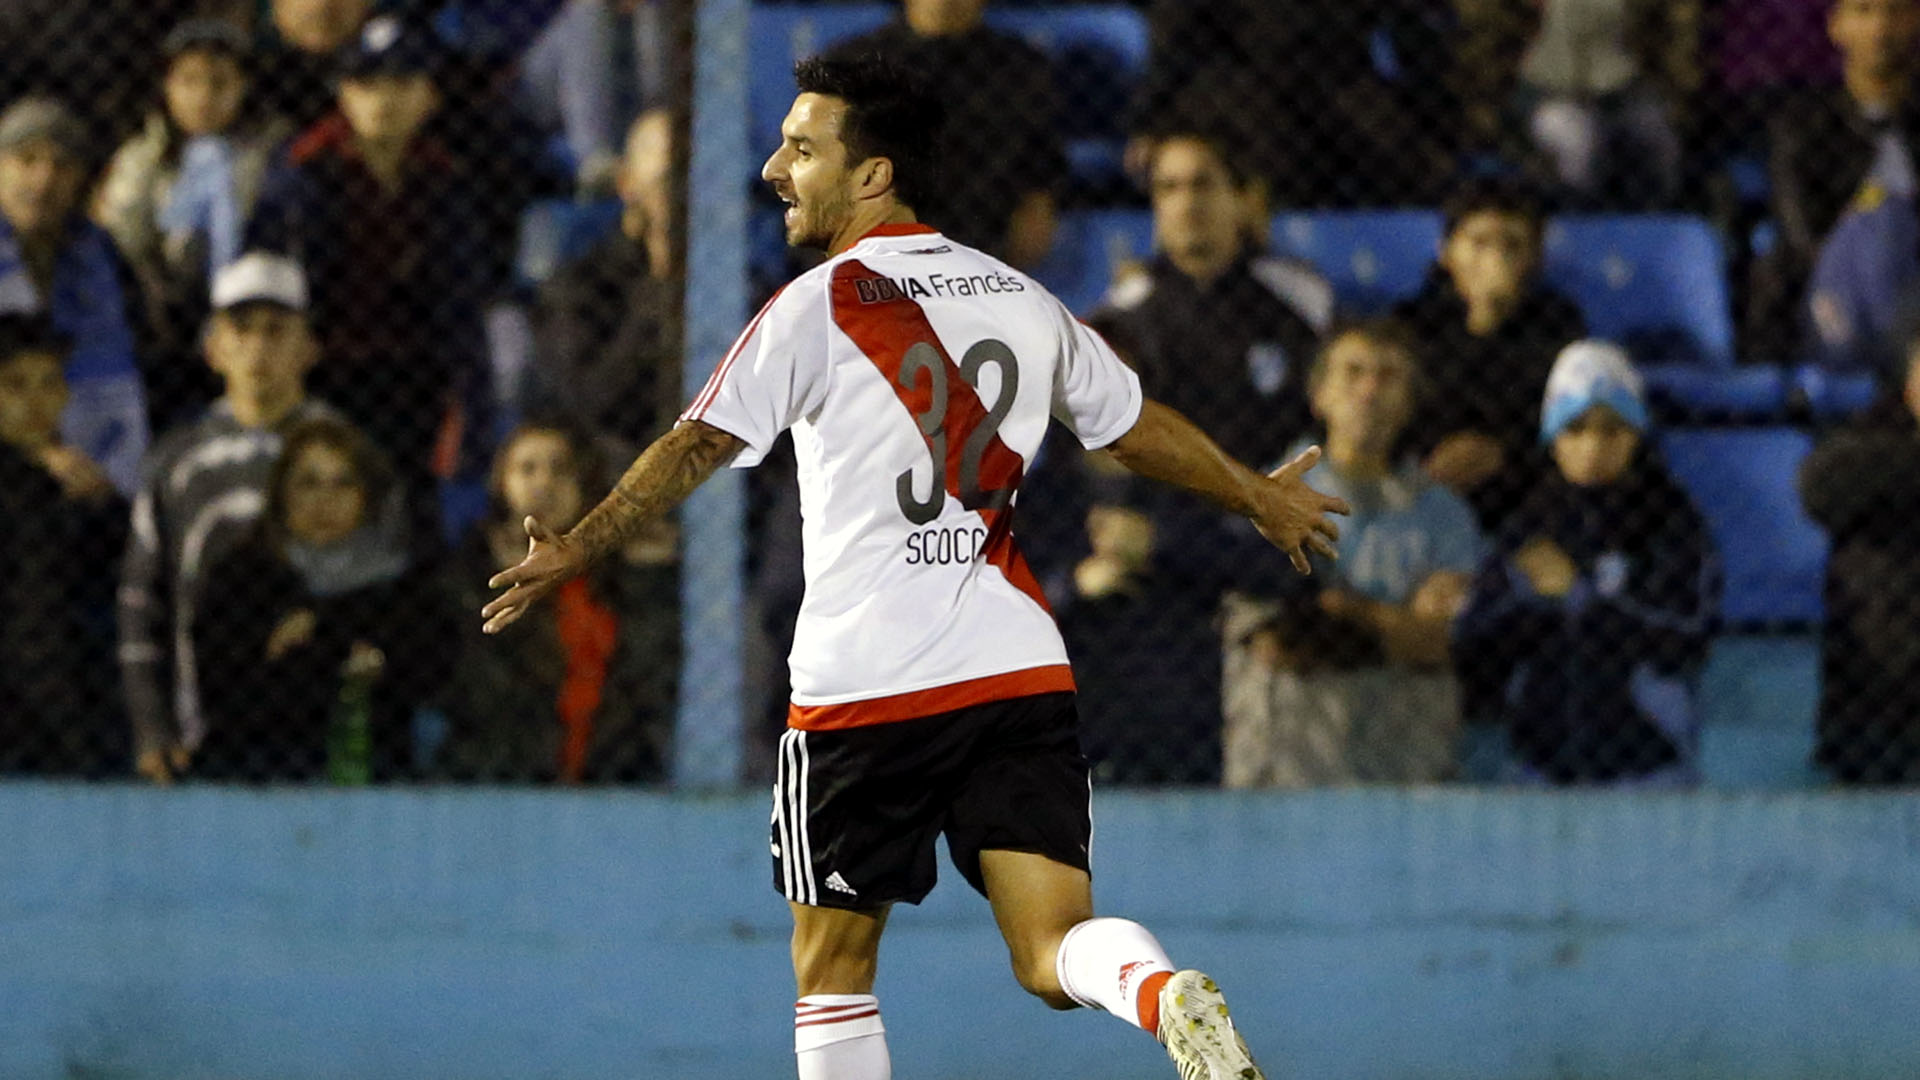 Ignacio Scocco comemora seu gol pelo River (Photo by Gabriel Rossi/Getty Images)